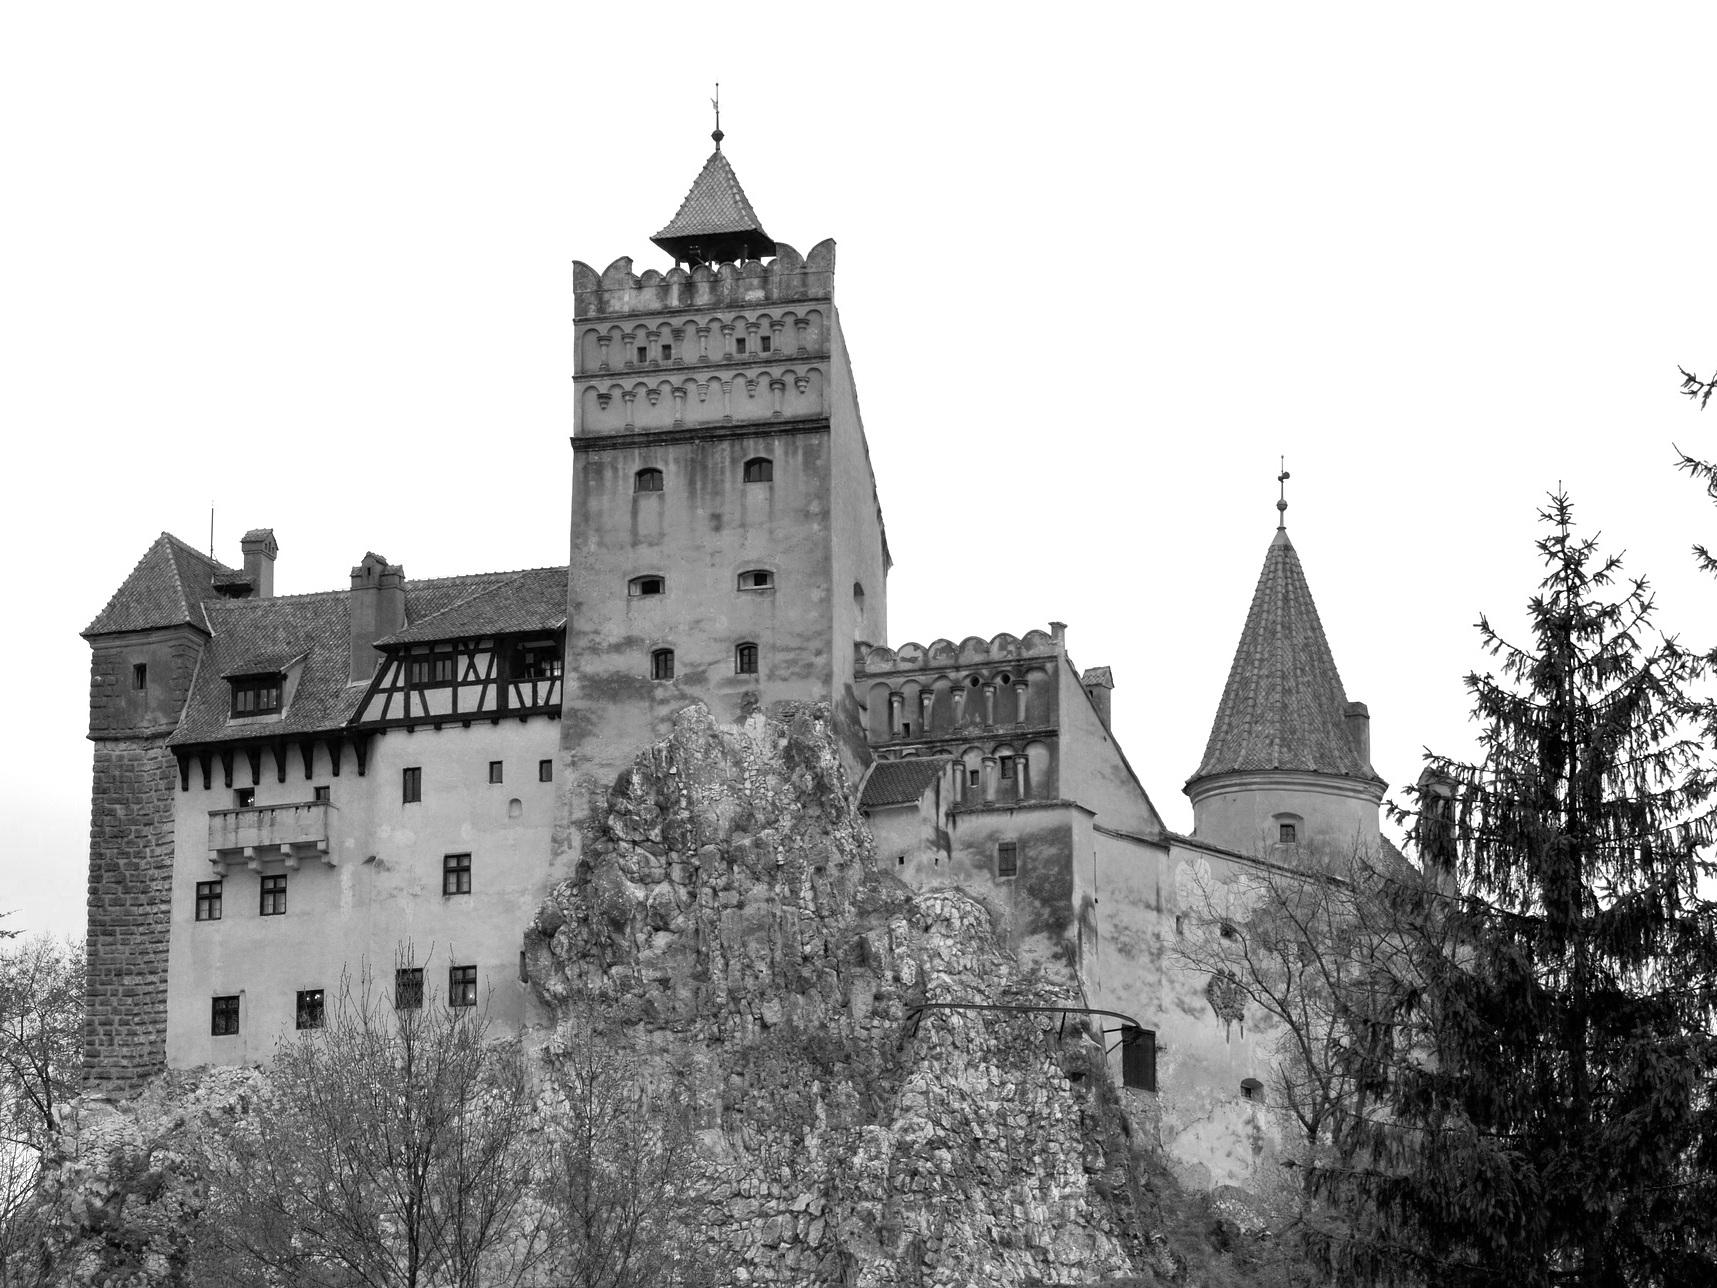 fortress-2413390_1920.jpg